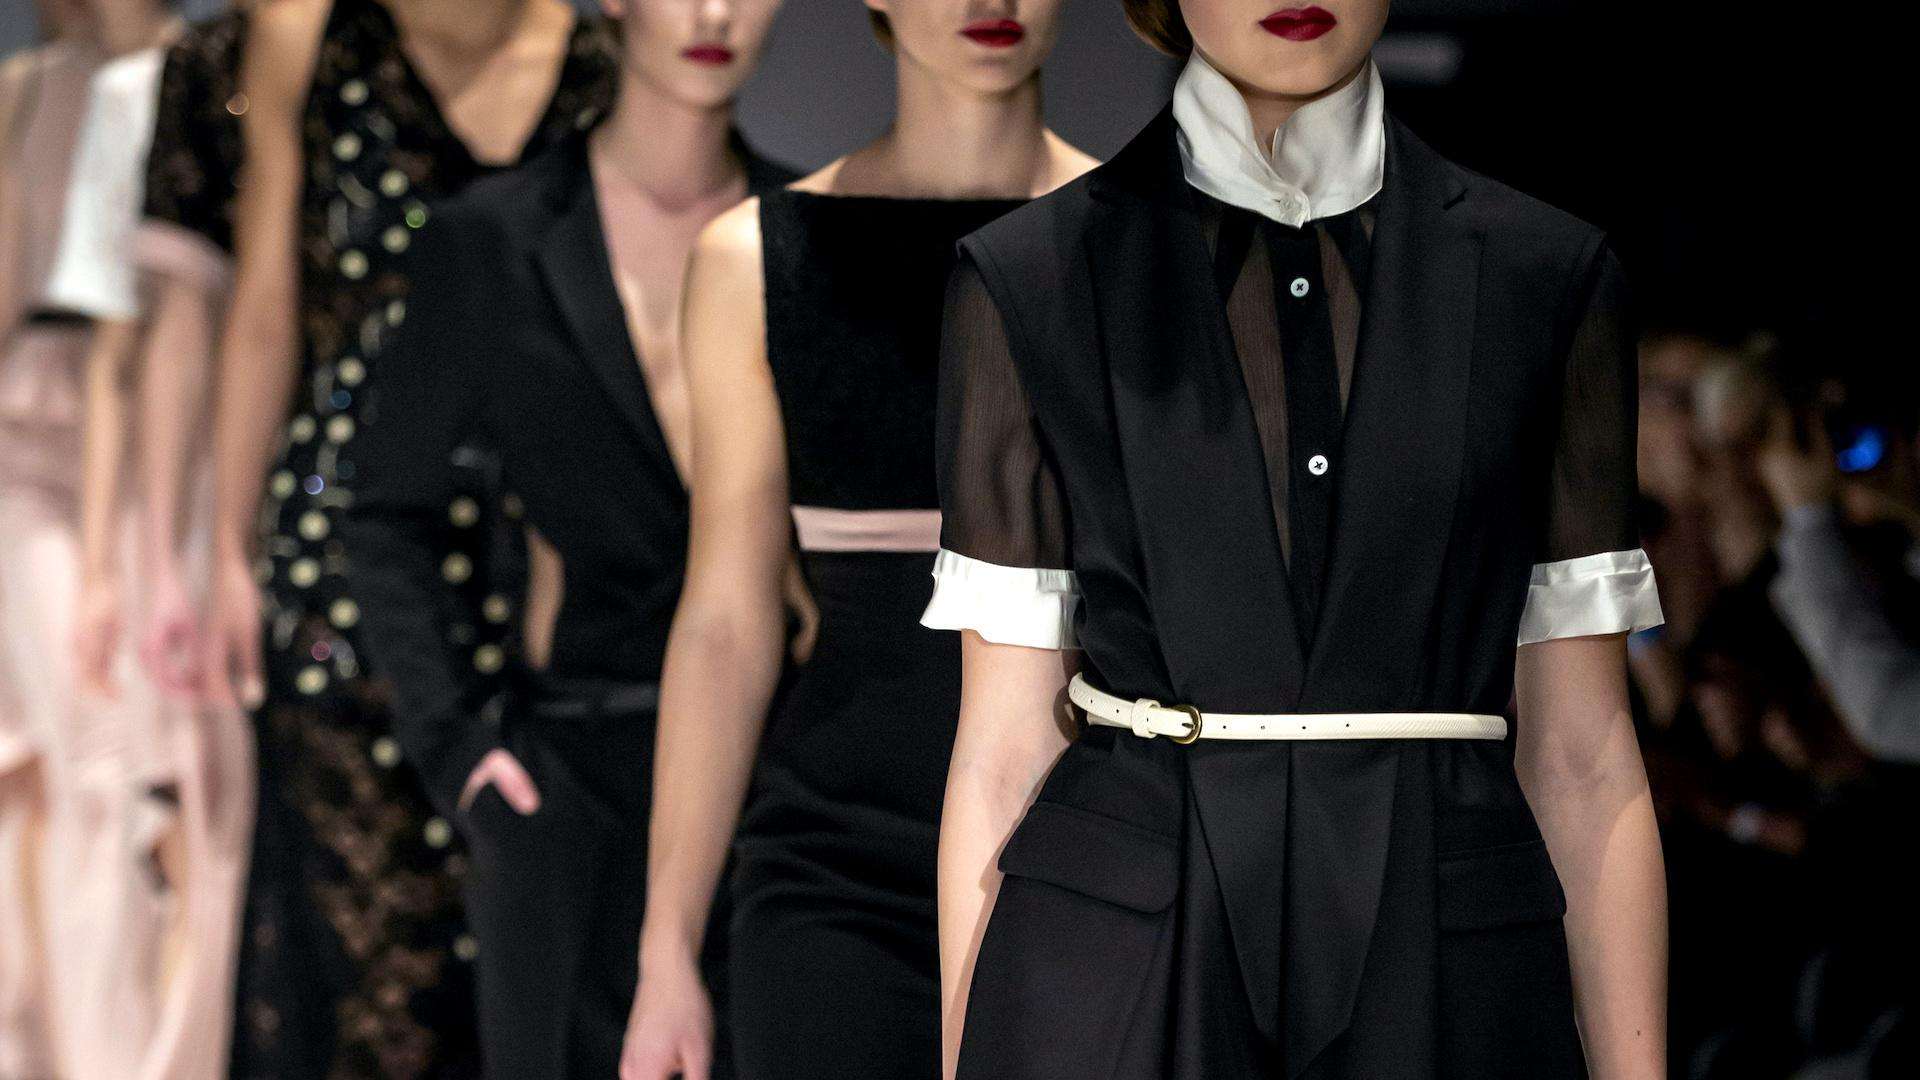 Fw7mhio6 Rzerm,Elegant Maxi Dresses For Weddings